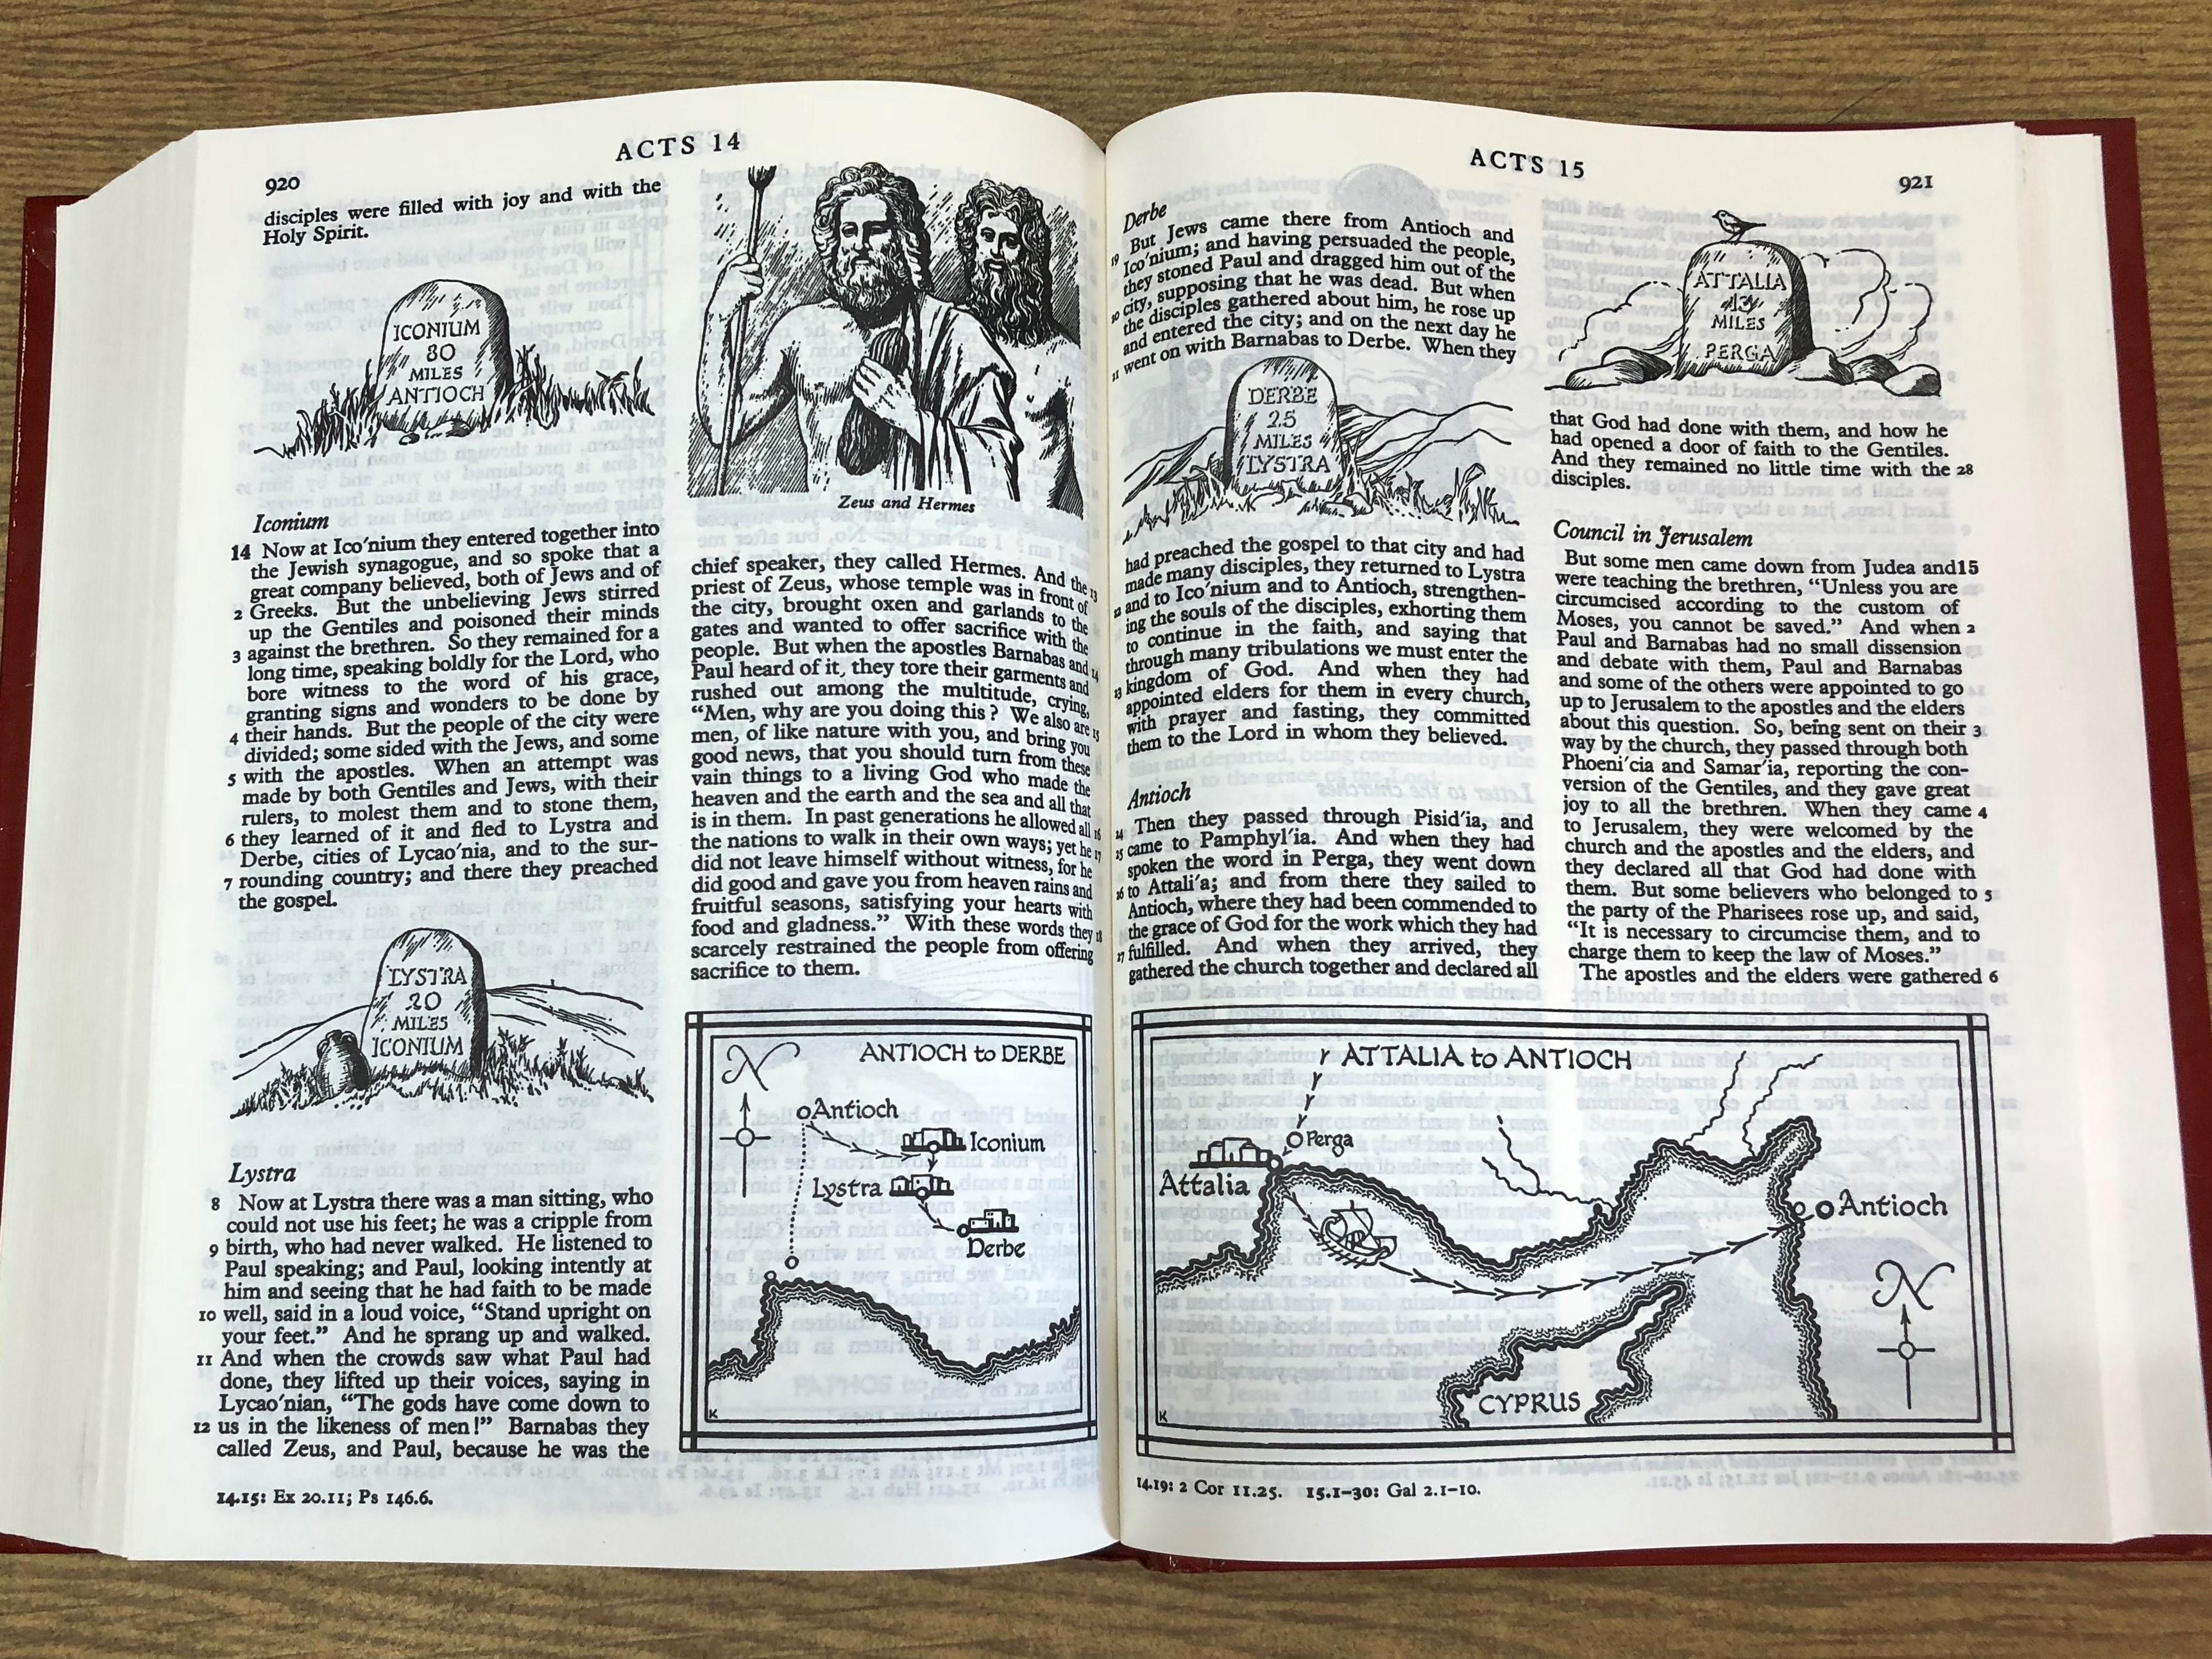 english-bible-revised-standard-version-rsv-burg-13-.jpg